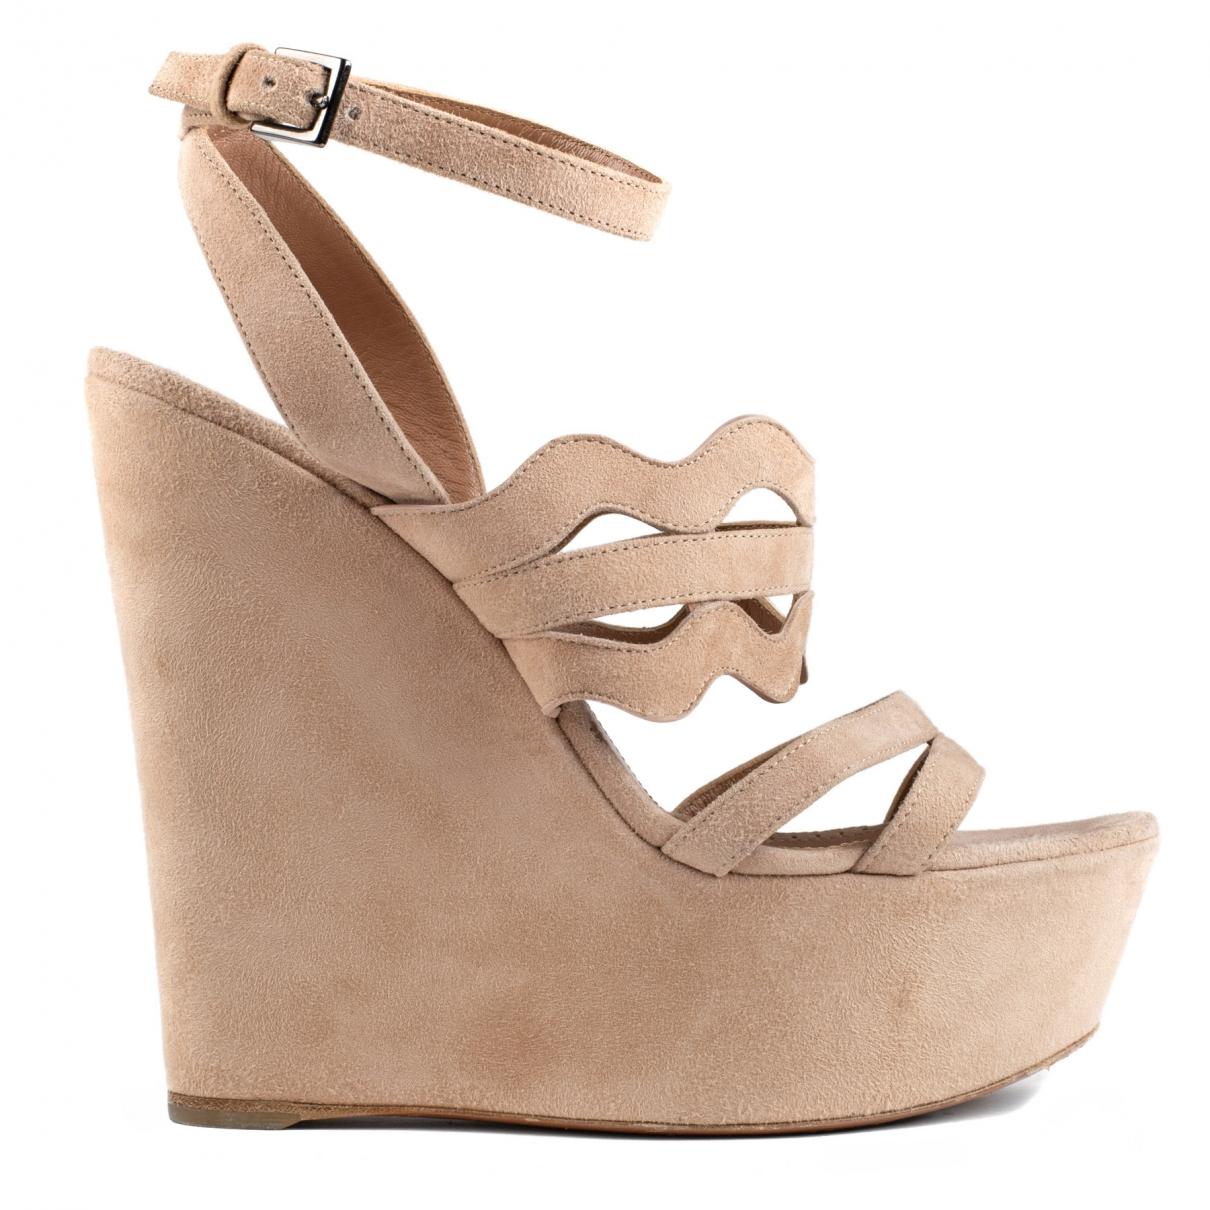 Alaïa \N Beige Suede Sandals for Women 37 EU